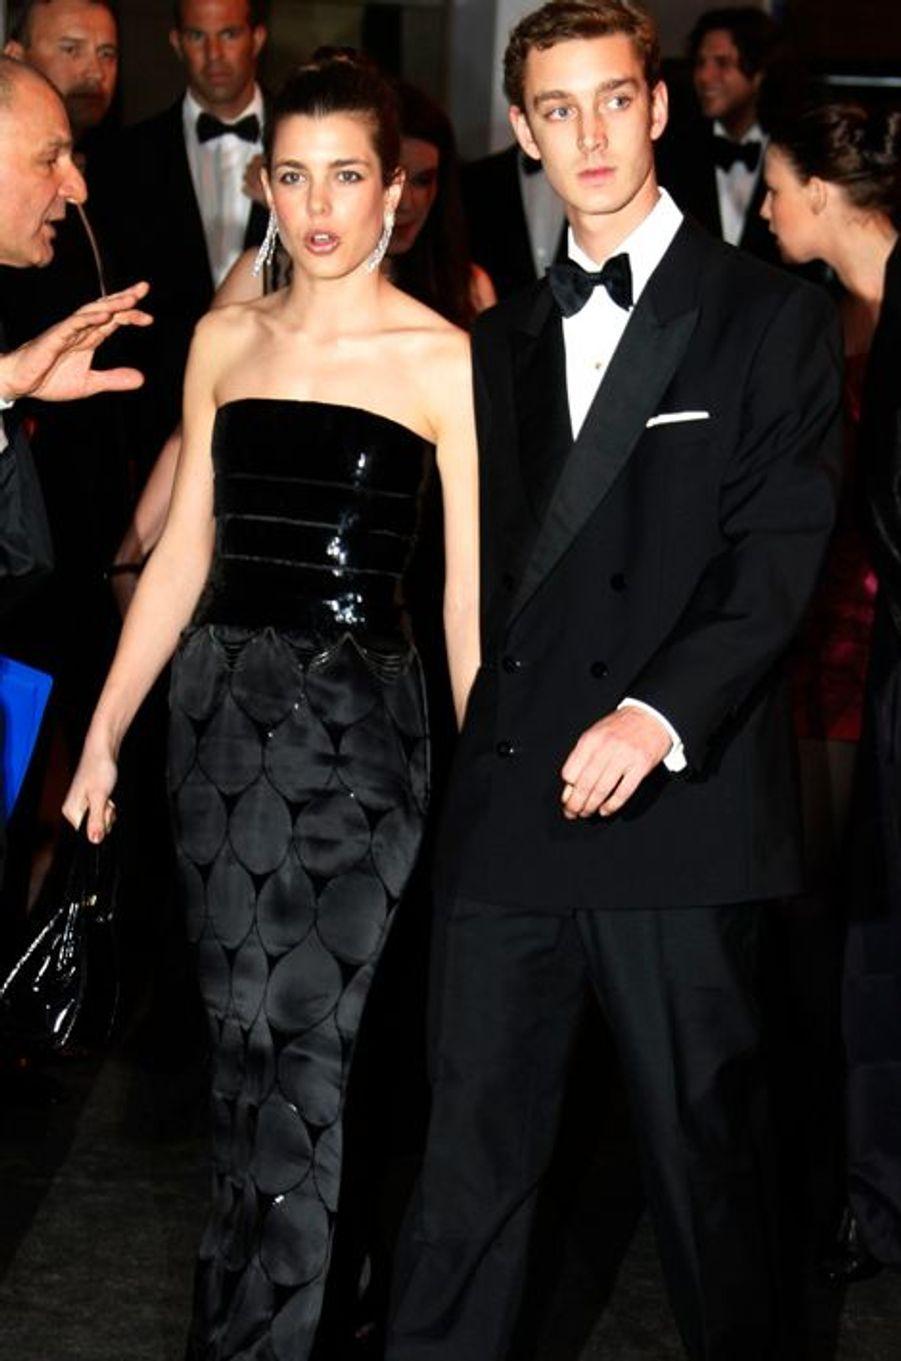 Charlotte Casiraghi avec Pierre Casiraghi, le 28 mars 2009